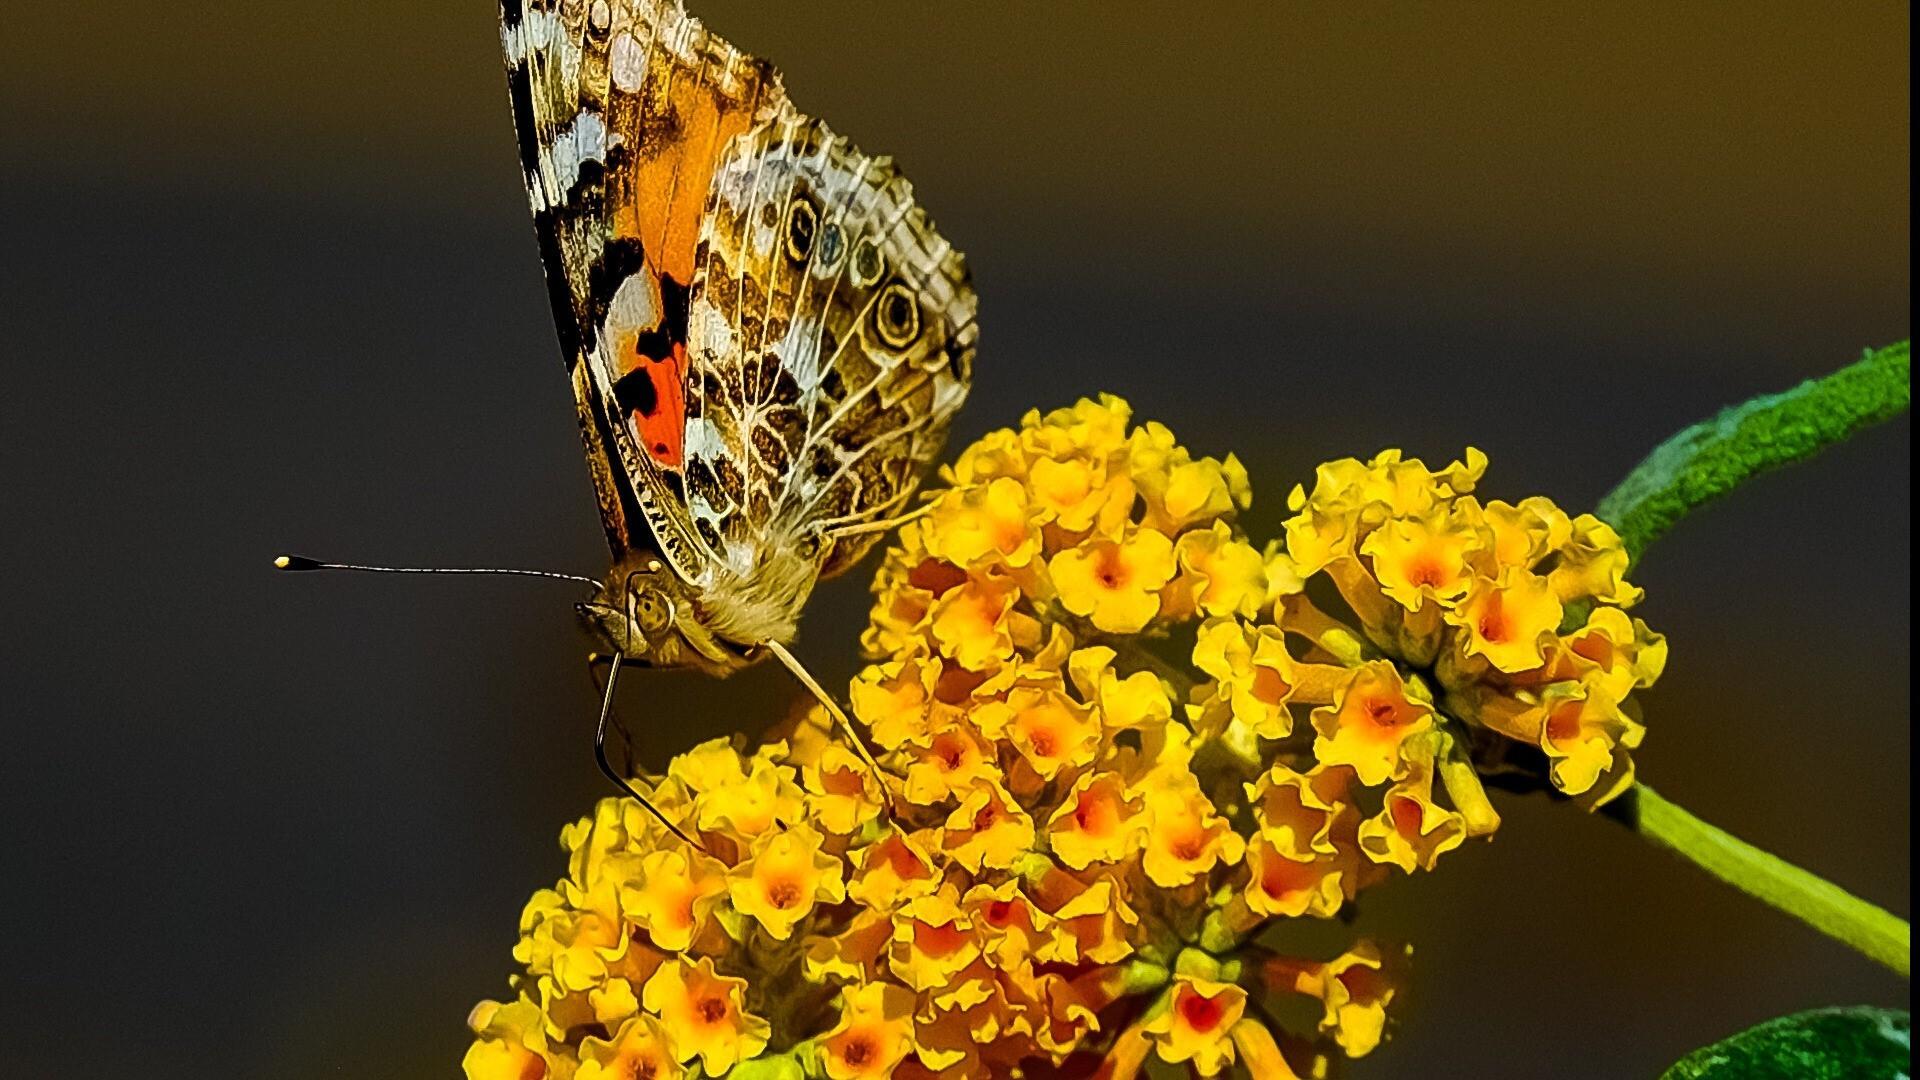 Butterfly on Yellow Flower Dazzling Wallpaper | HD Wallpapers